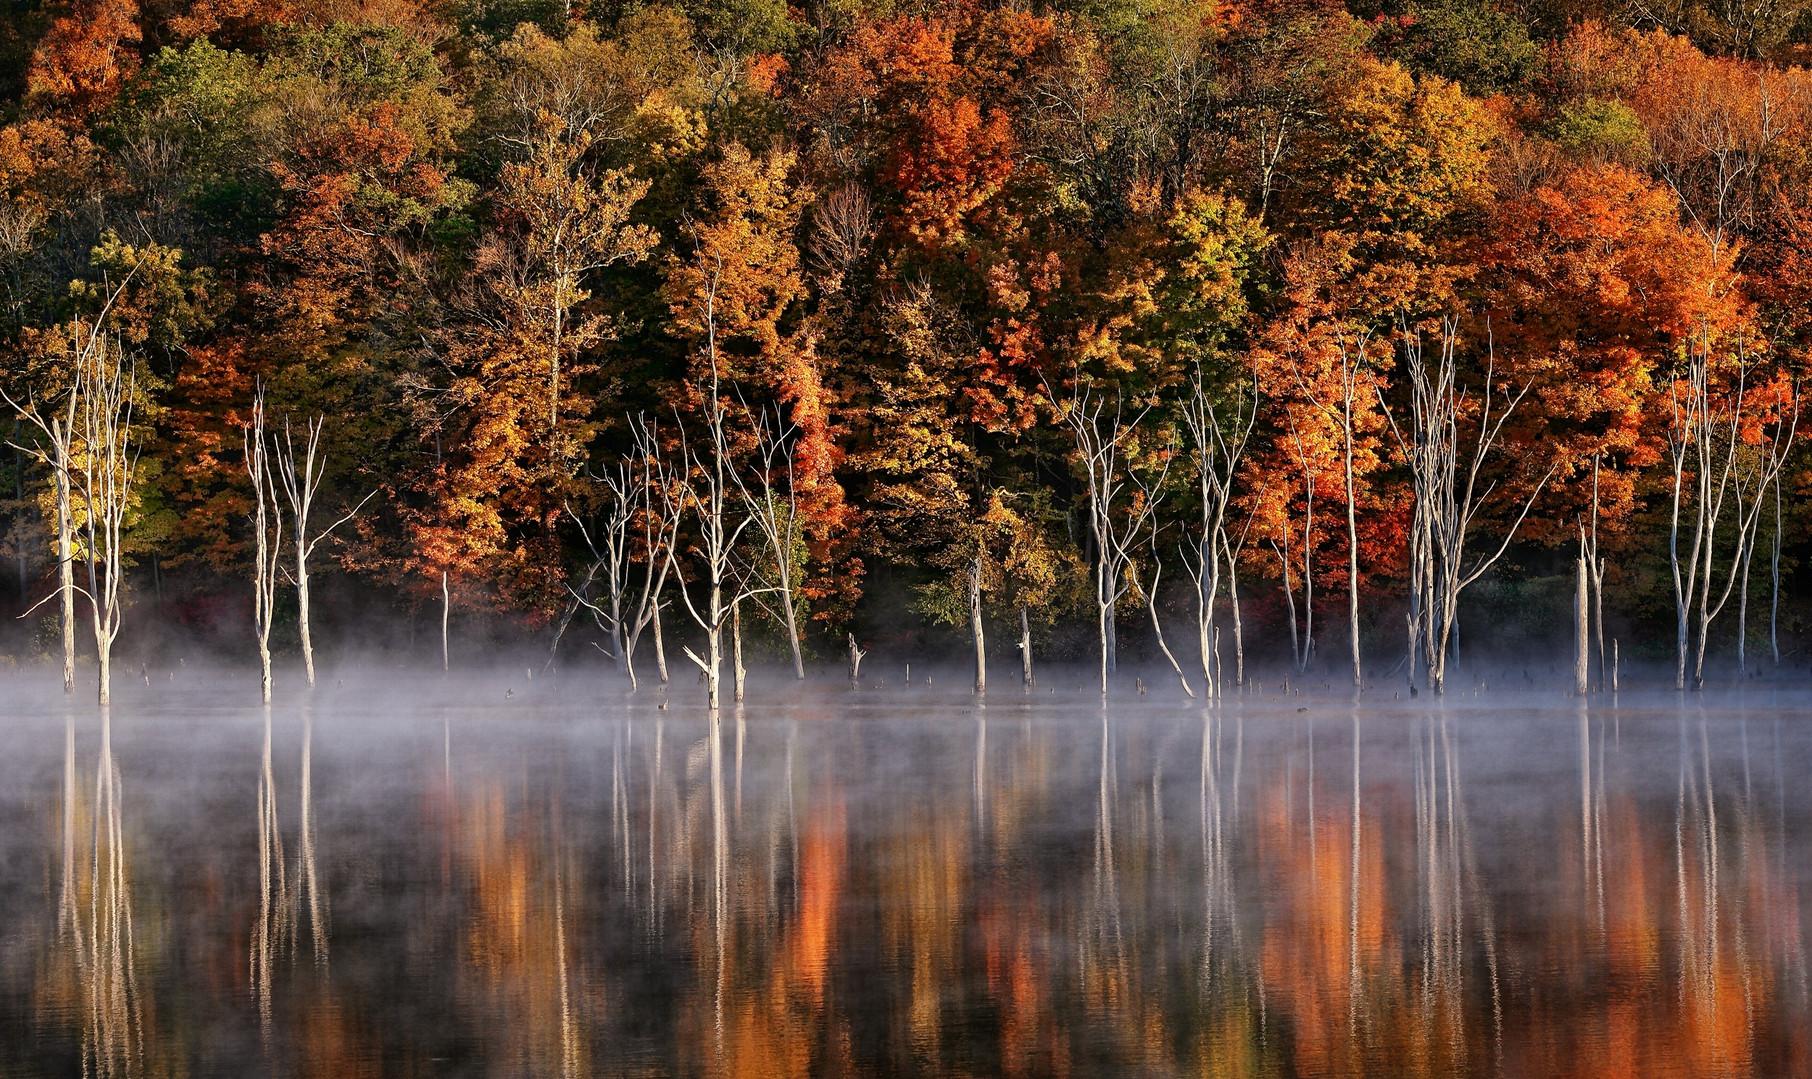 Monksville Reservoir Morning Mist - West Milford, NJ